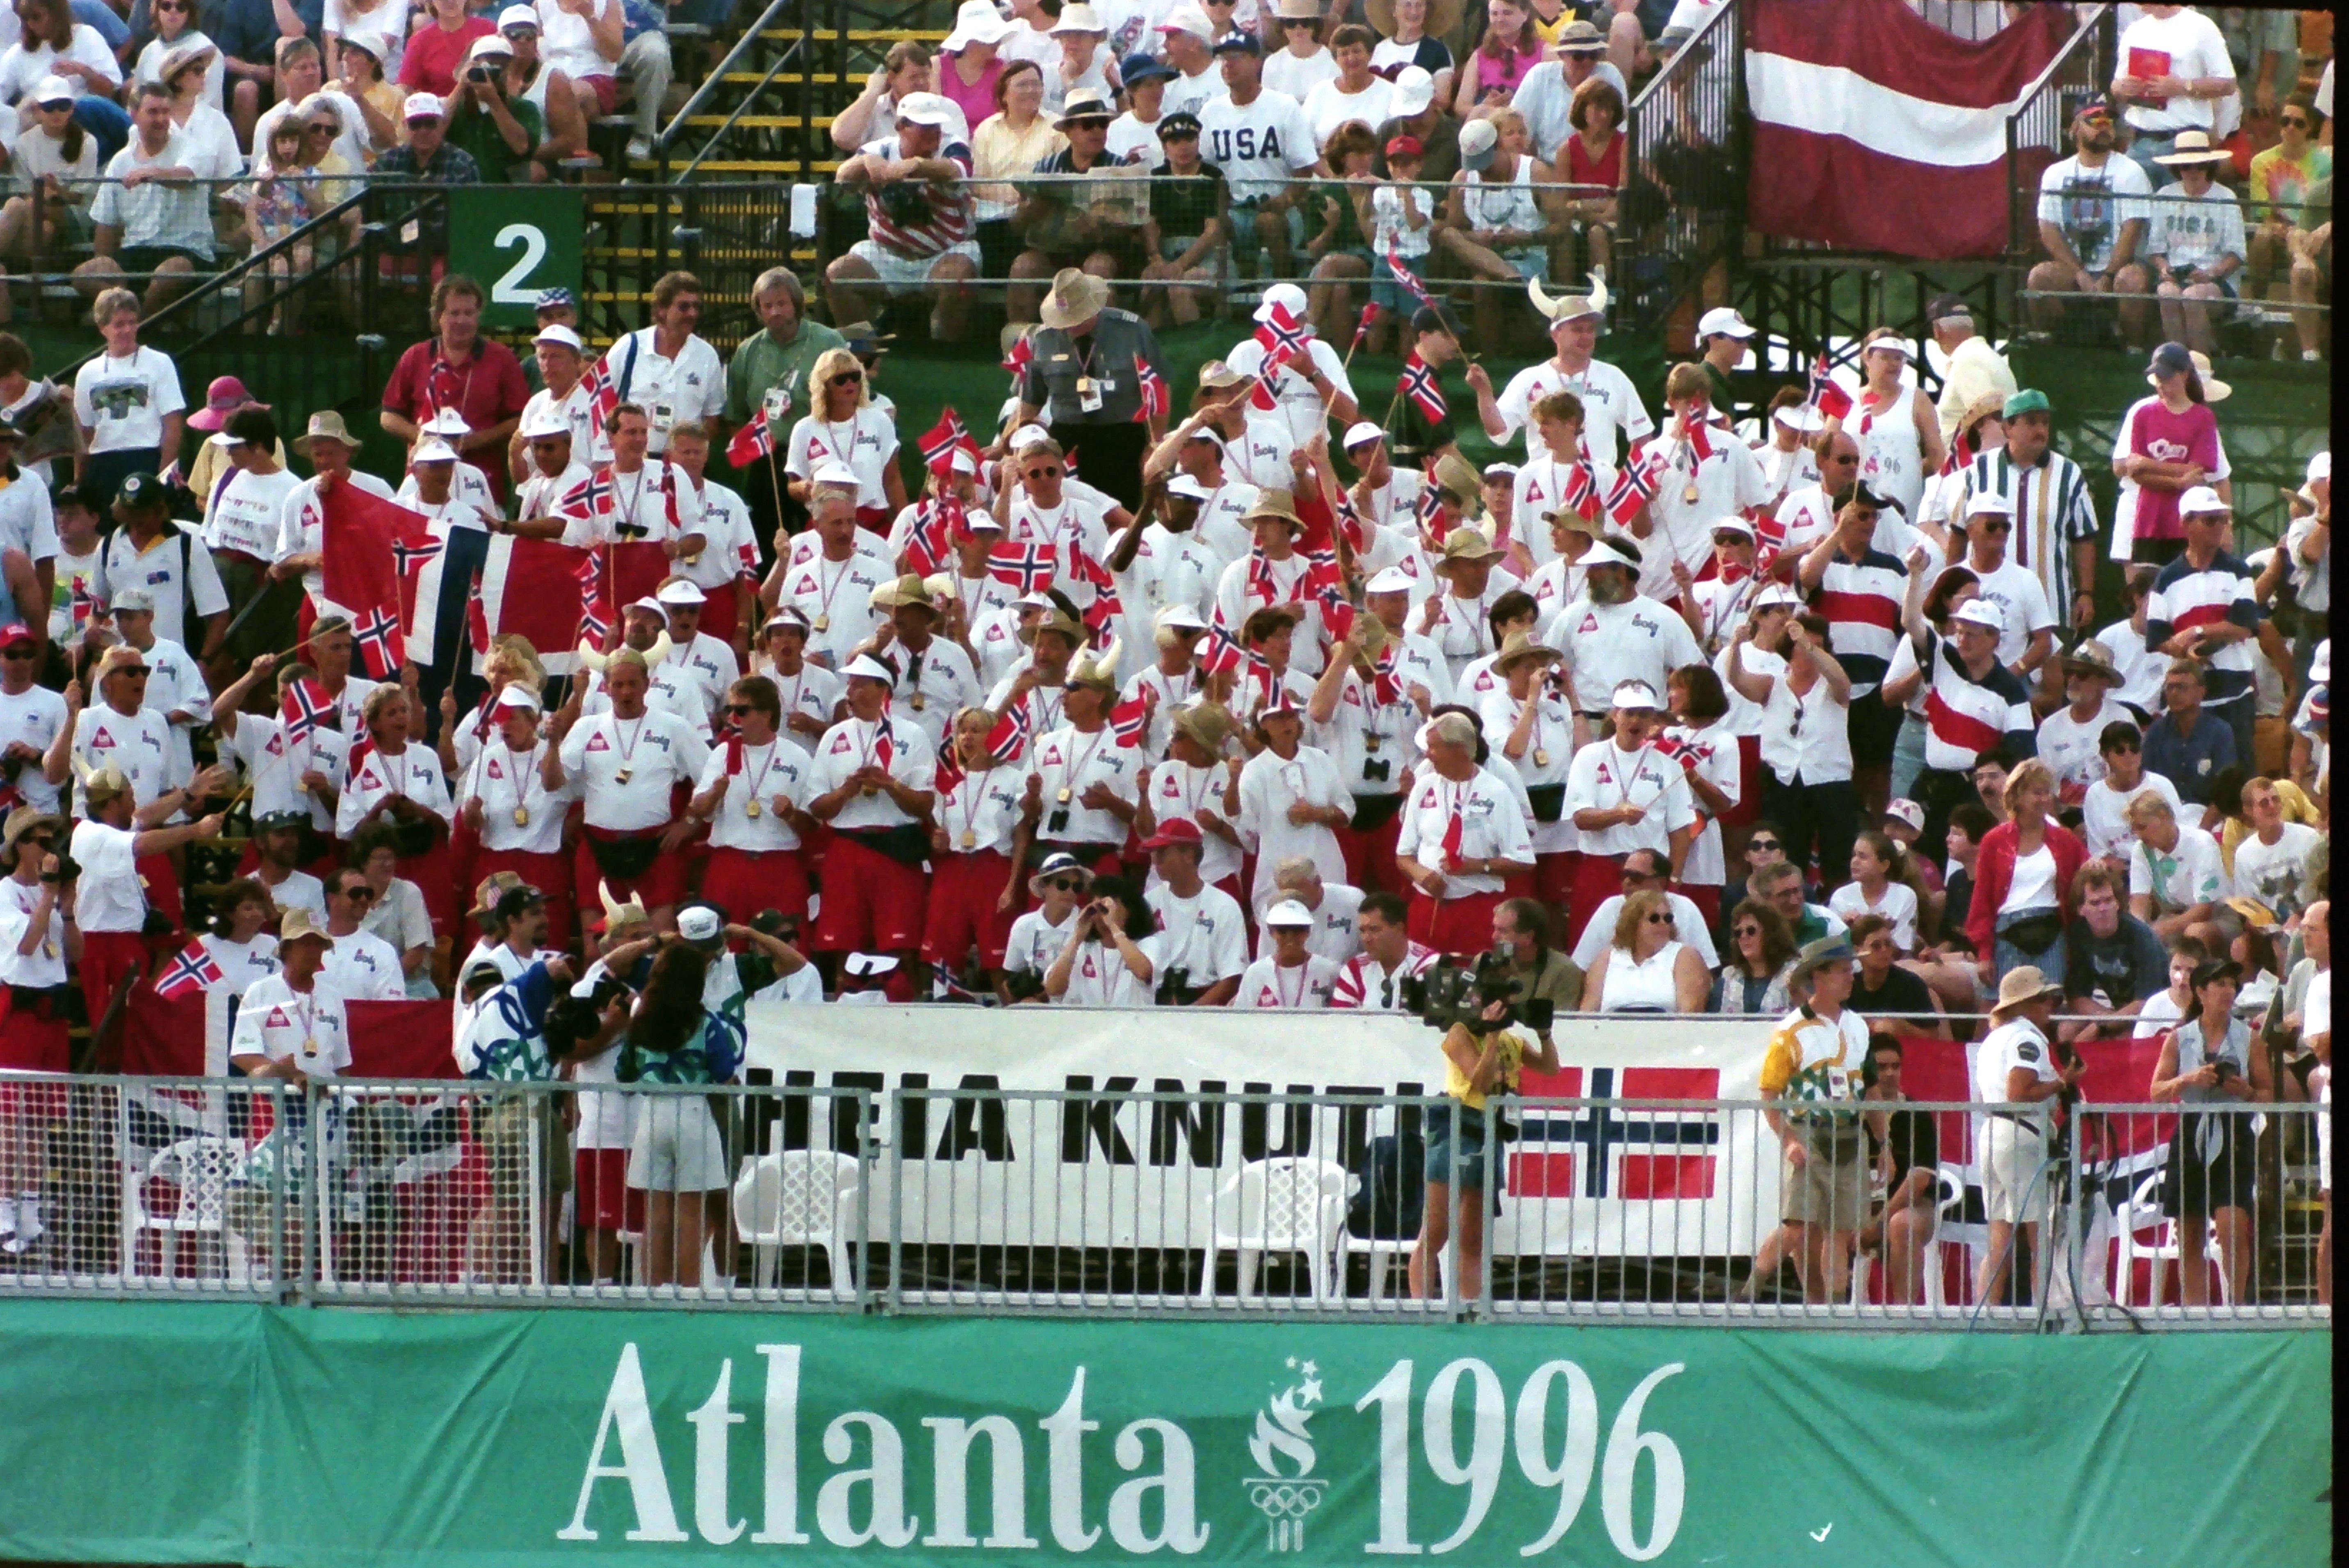 1996 crowd 5.jpg